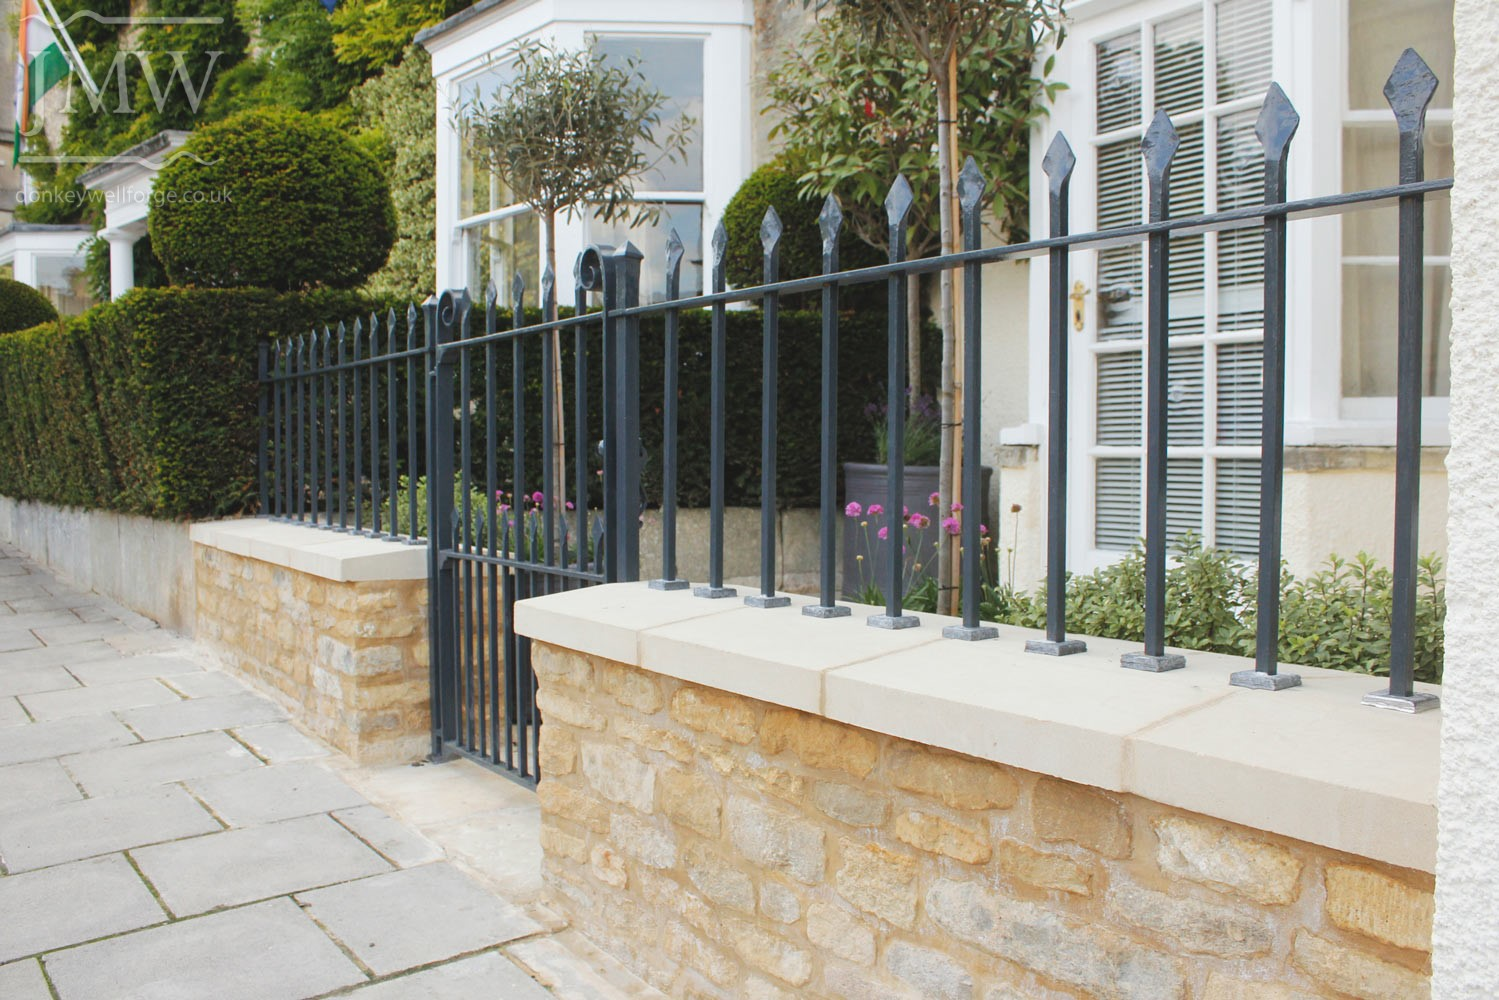 forged-ironwork-railings-gate-lead